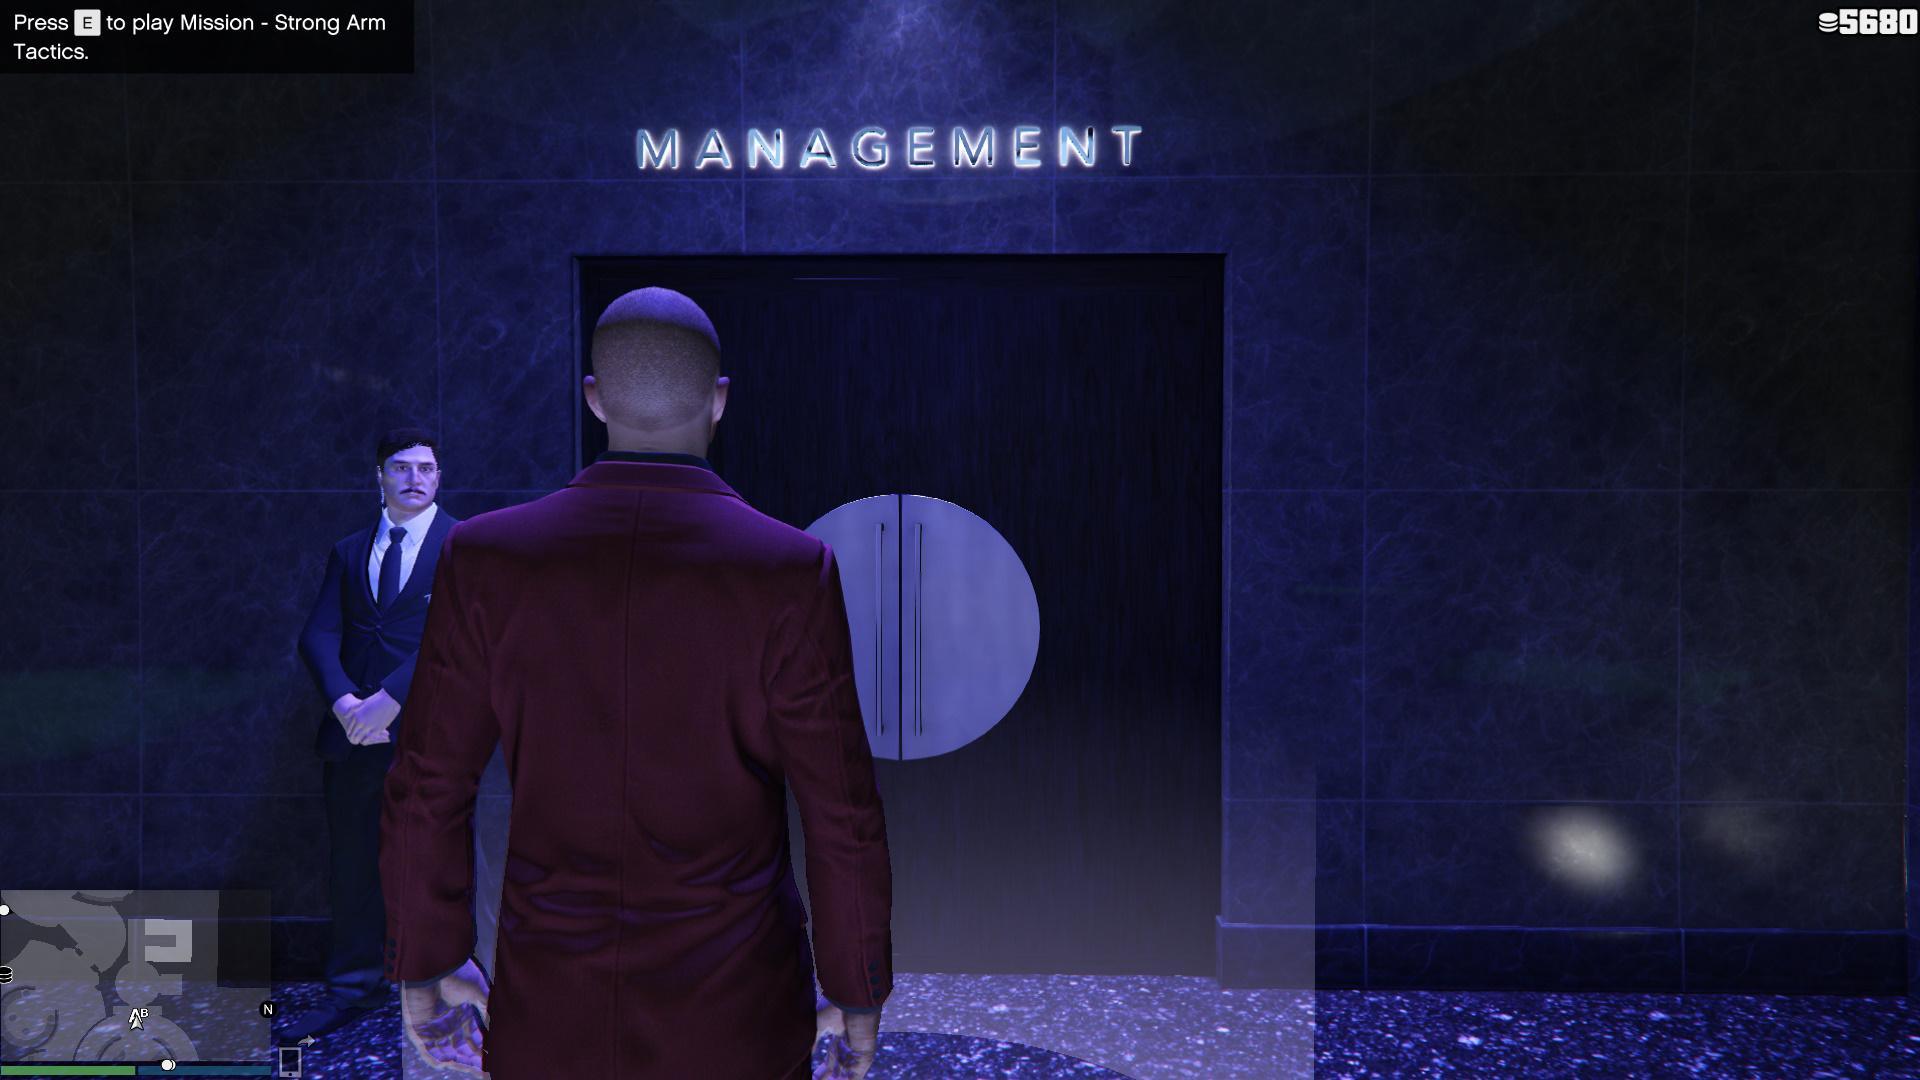 Image showing the management door in The Diamond Casino.